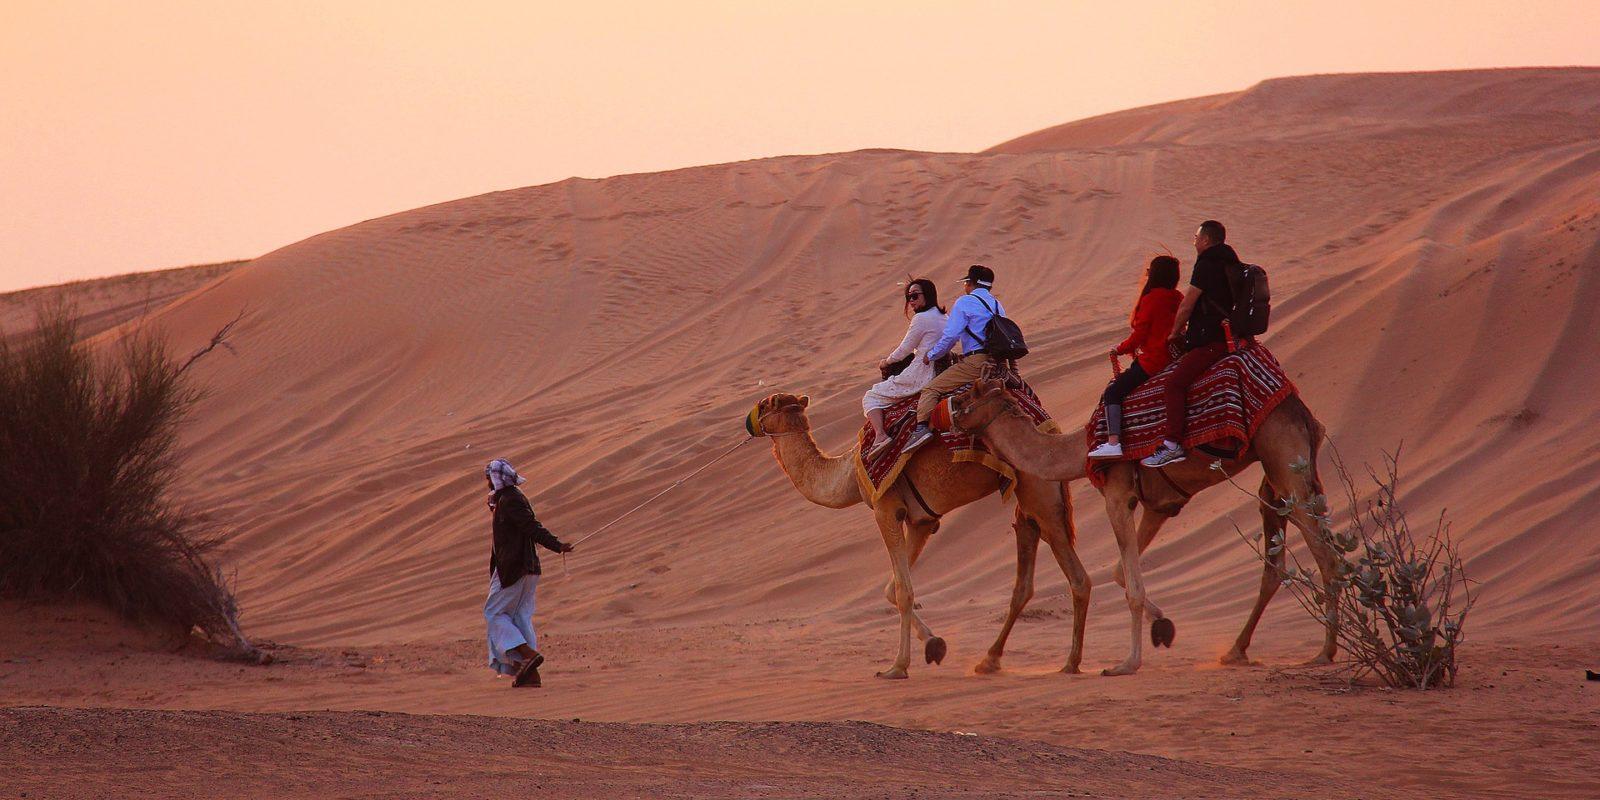 Camel-safari, Dubai